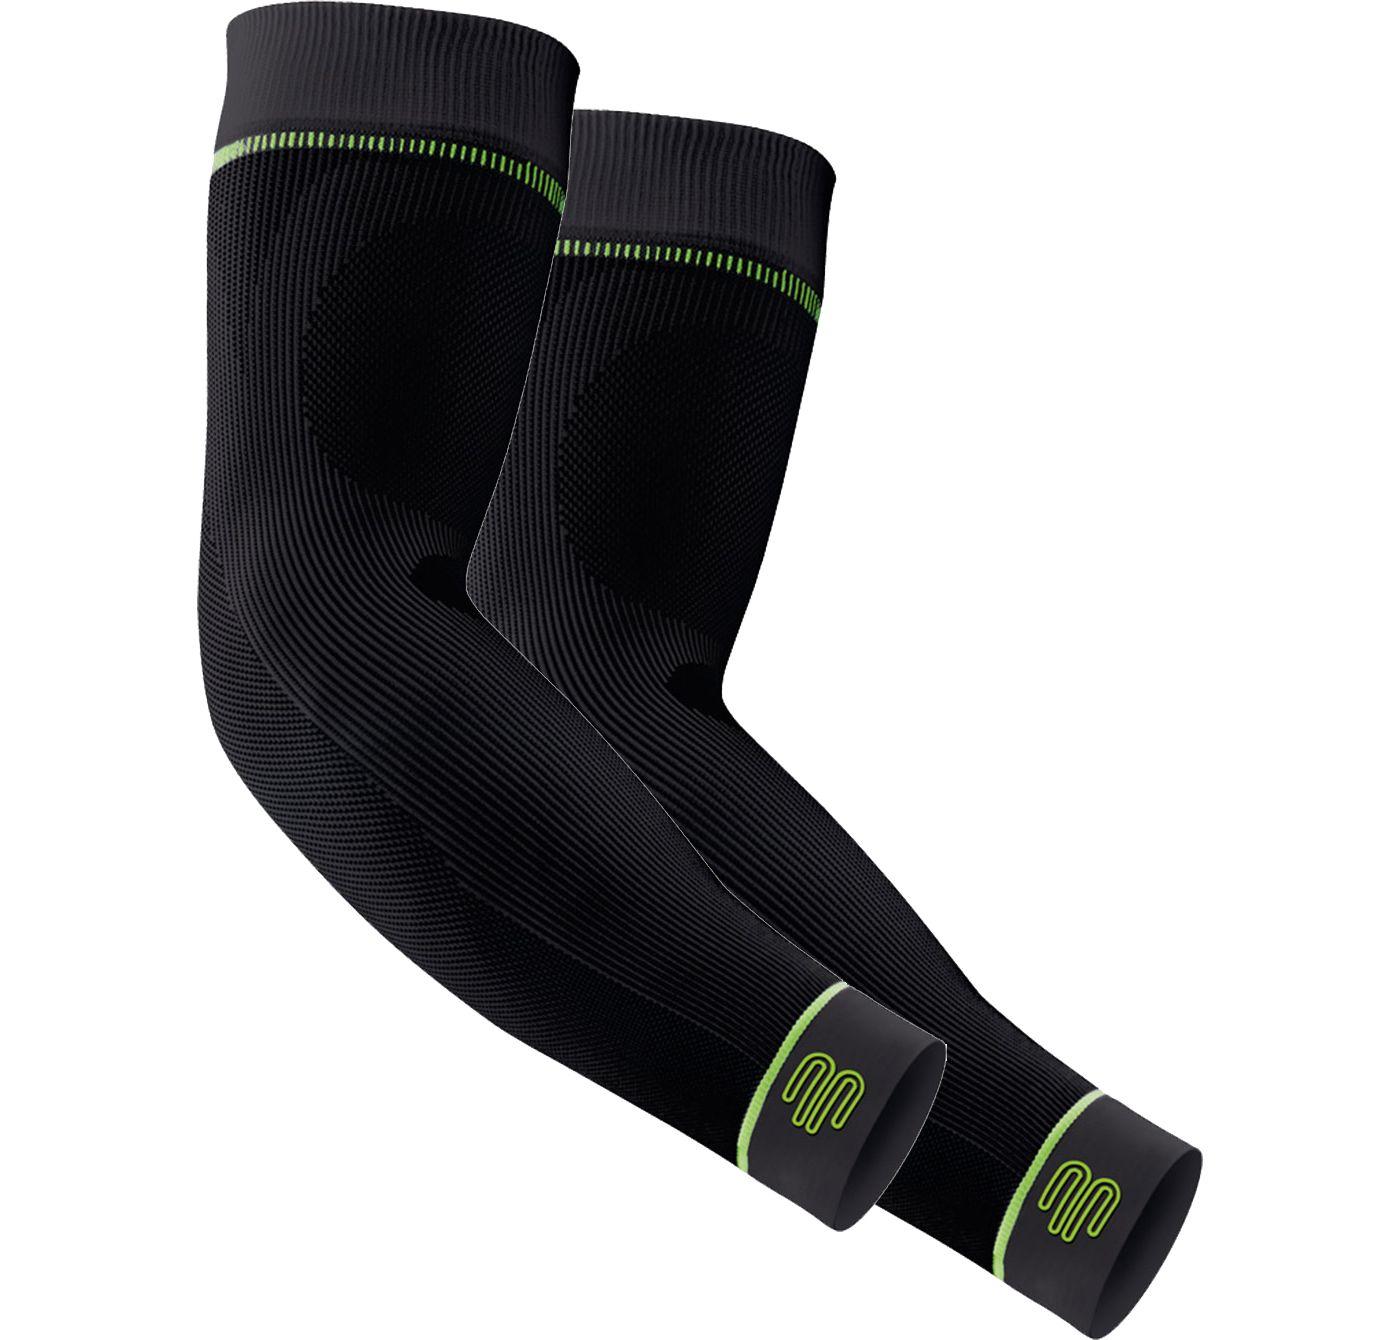 Bauerfeind Sports Compression Arm Sleeves